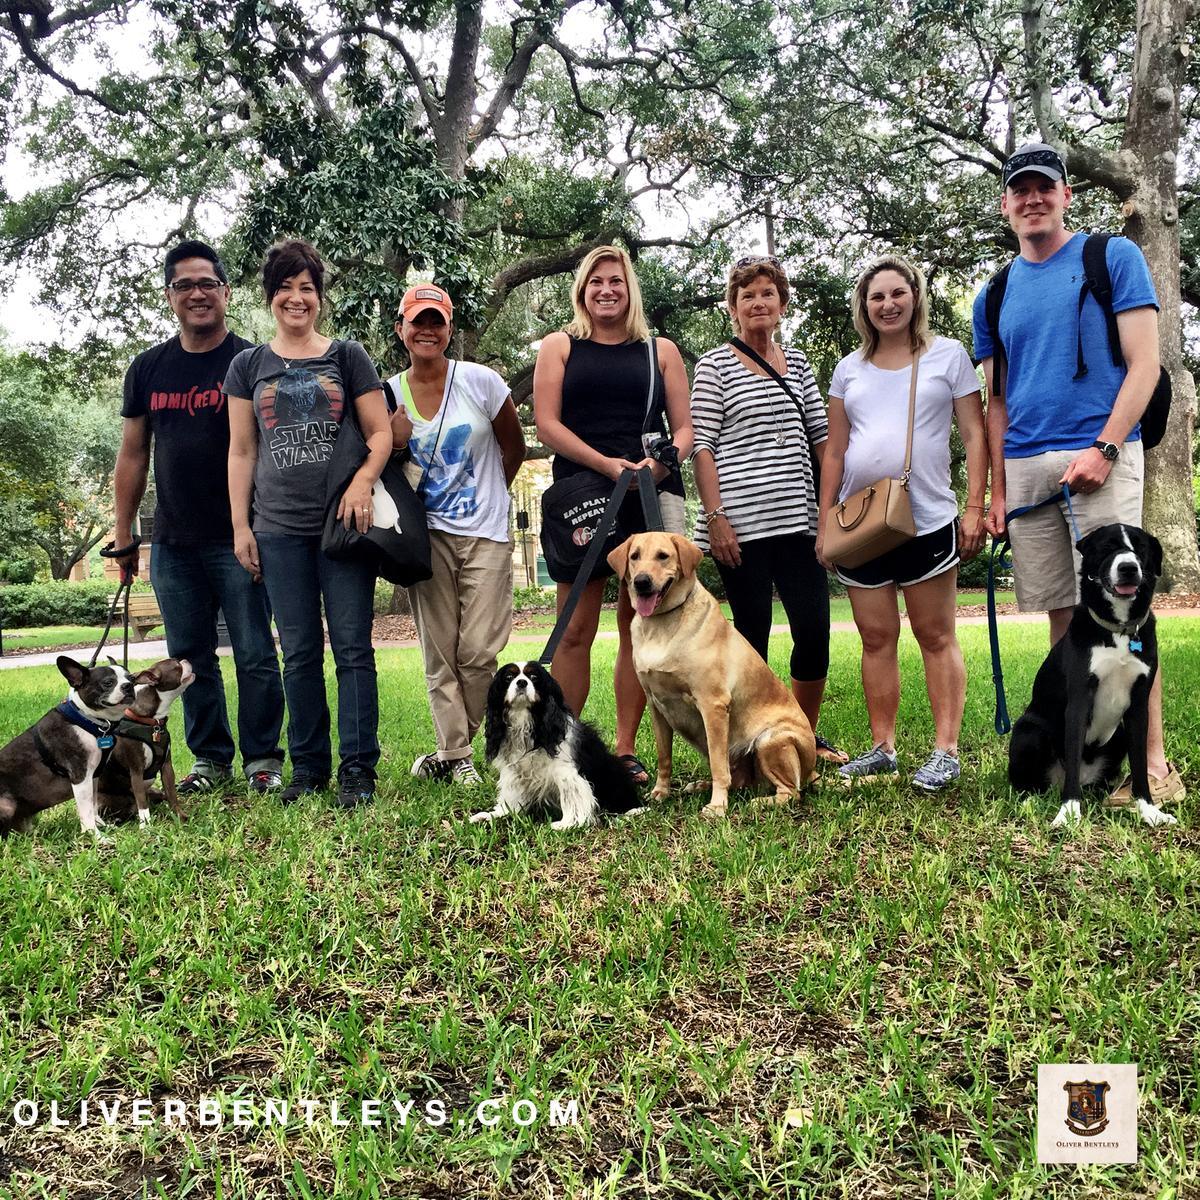 Oliver Bentleys Historic Dog Walk Tour- Savannah - Typical Group Tour